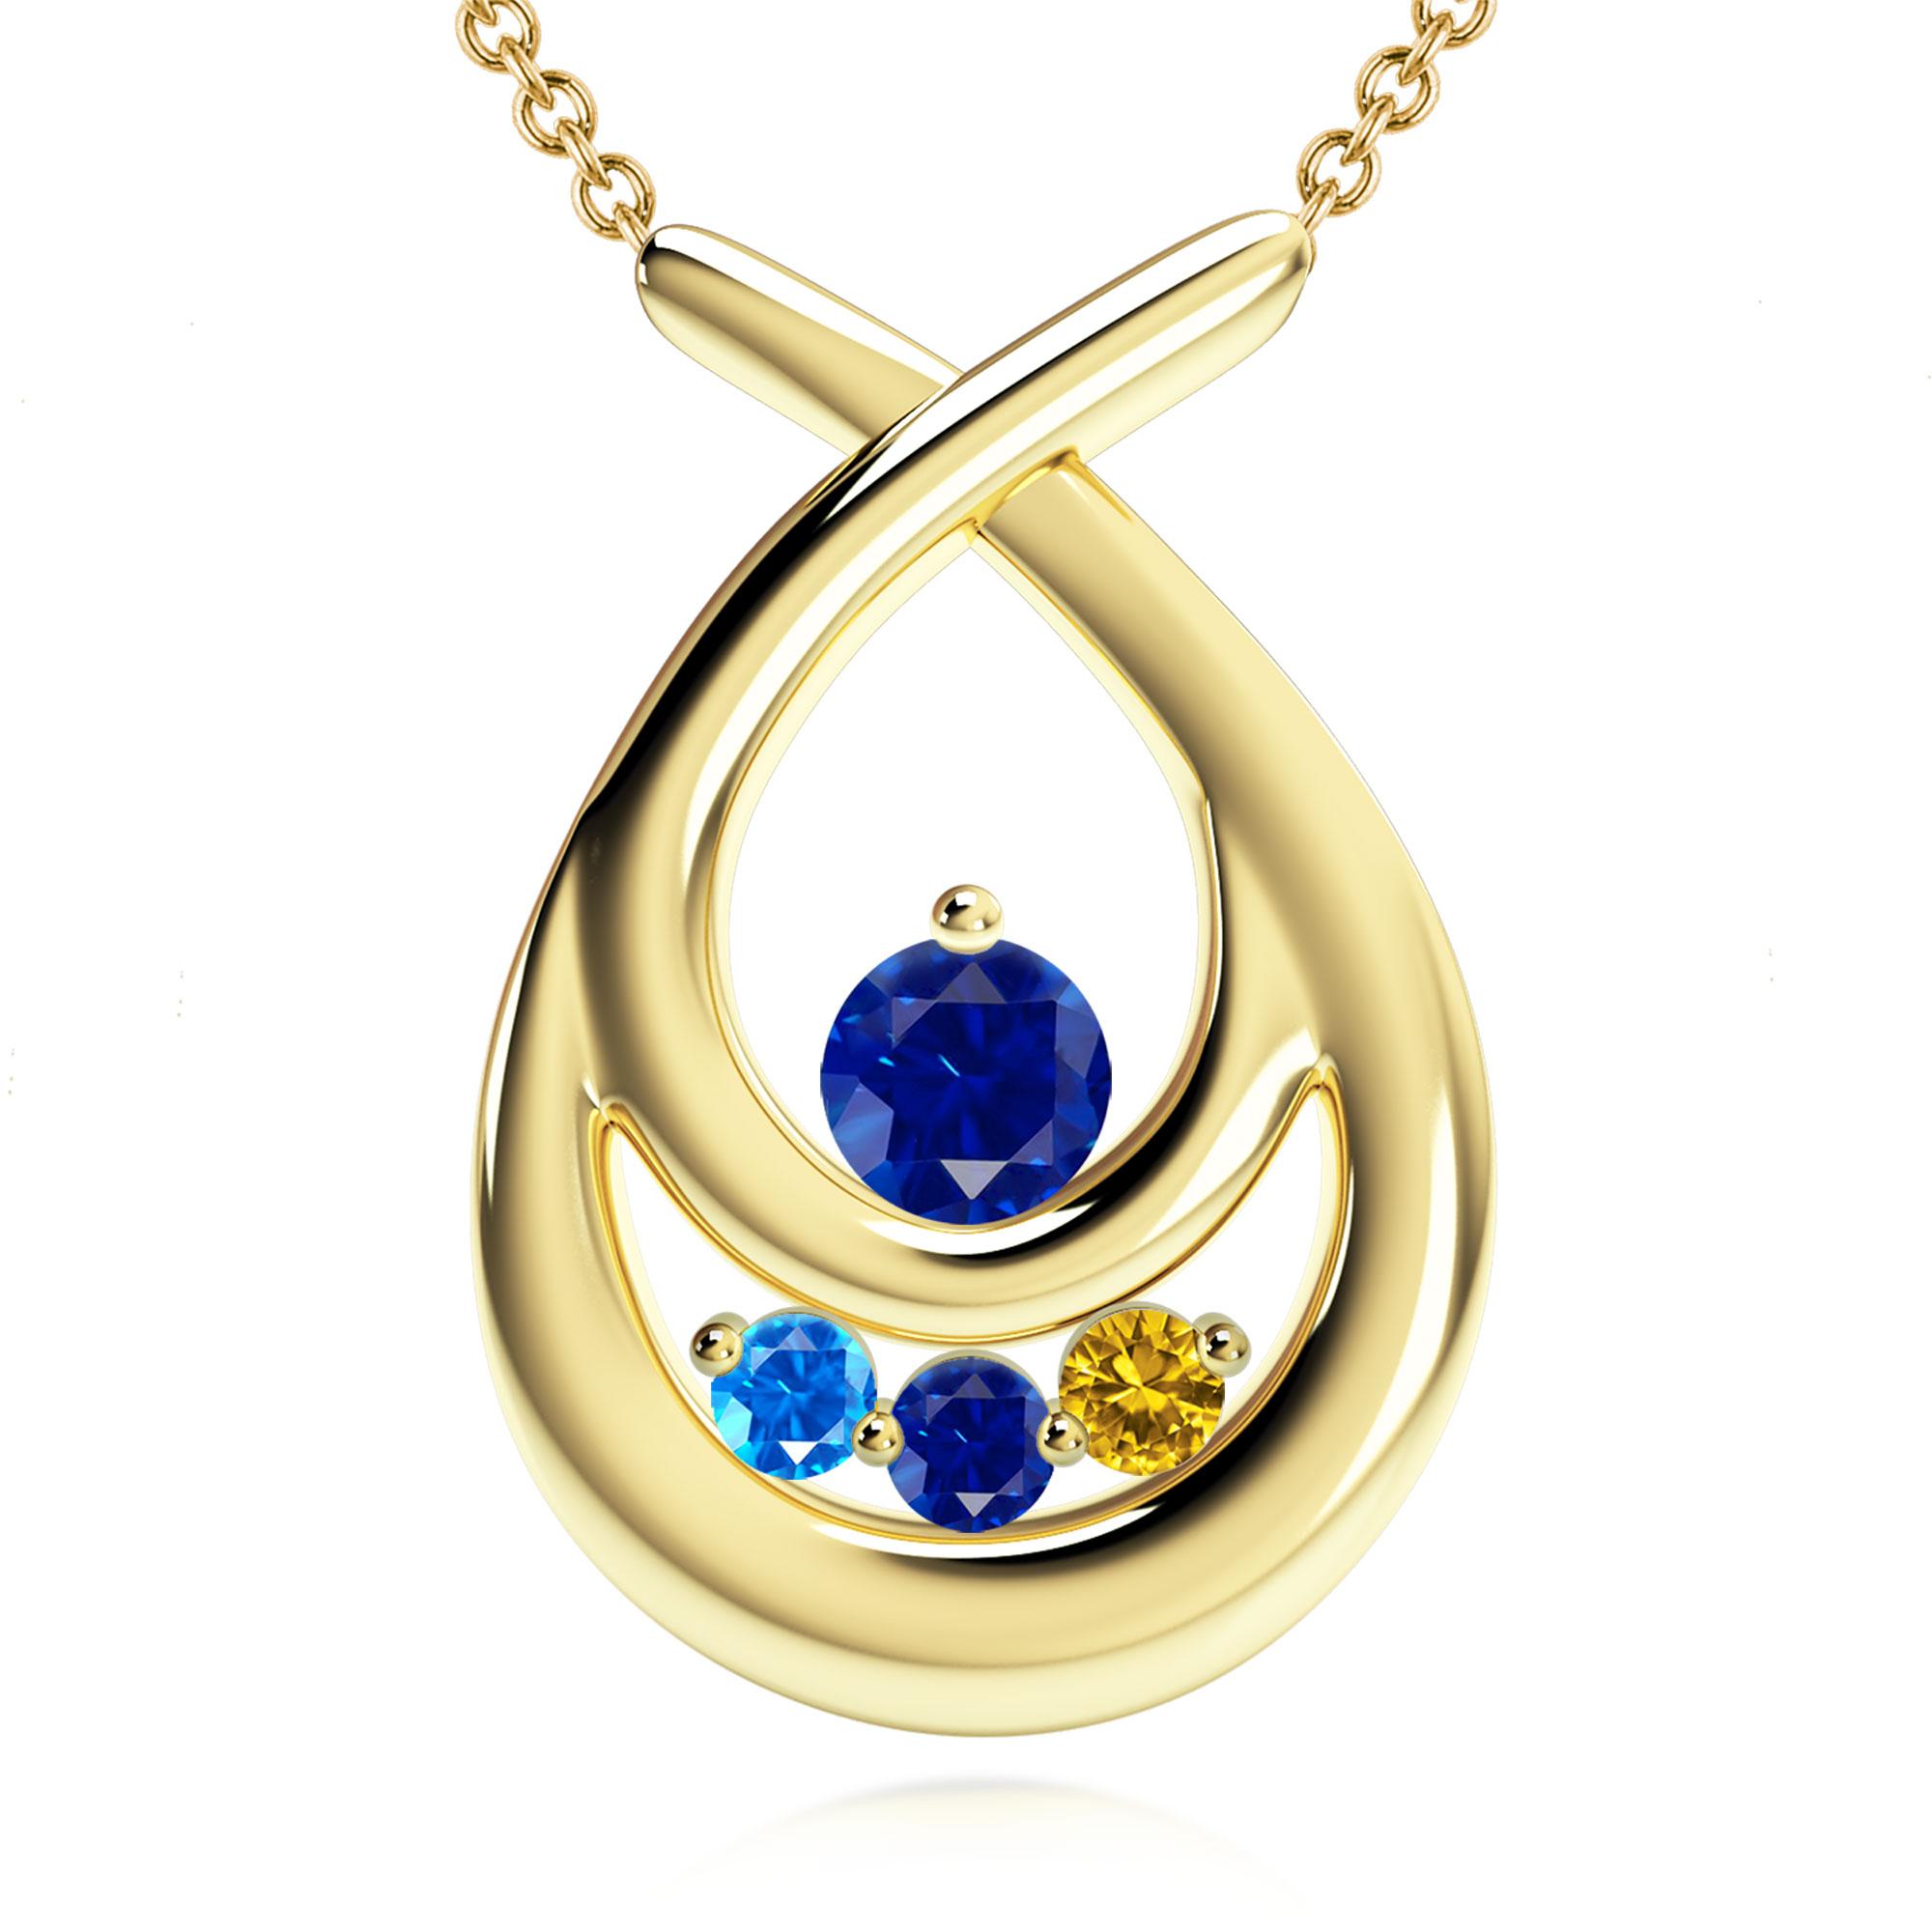 Mother's Custom Birthstone Teardrop Family Necklace (2-4 Gemstones)